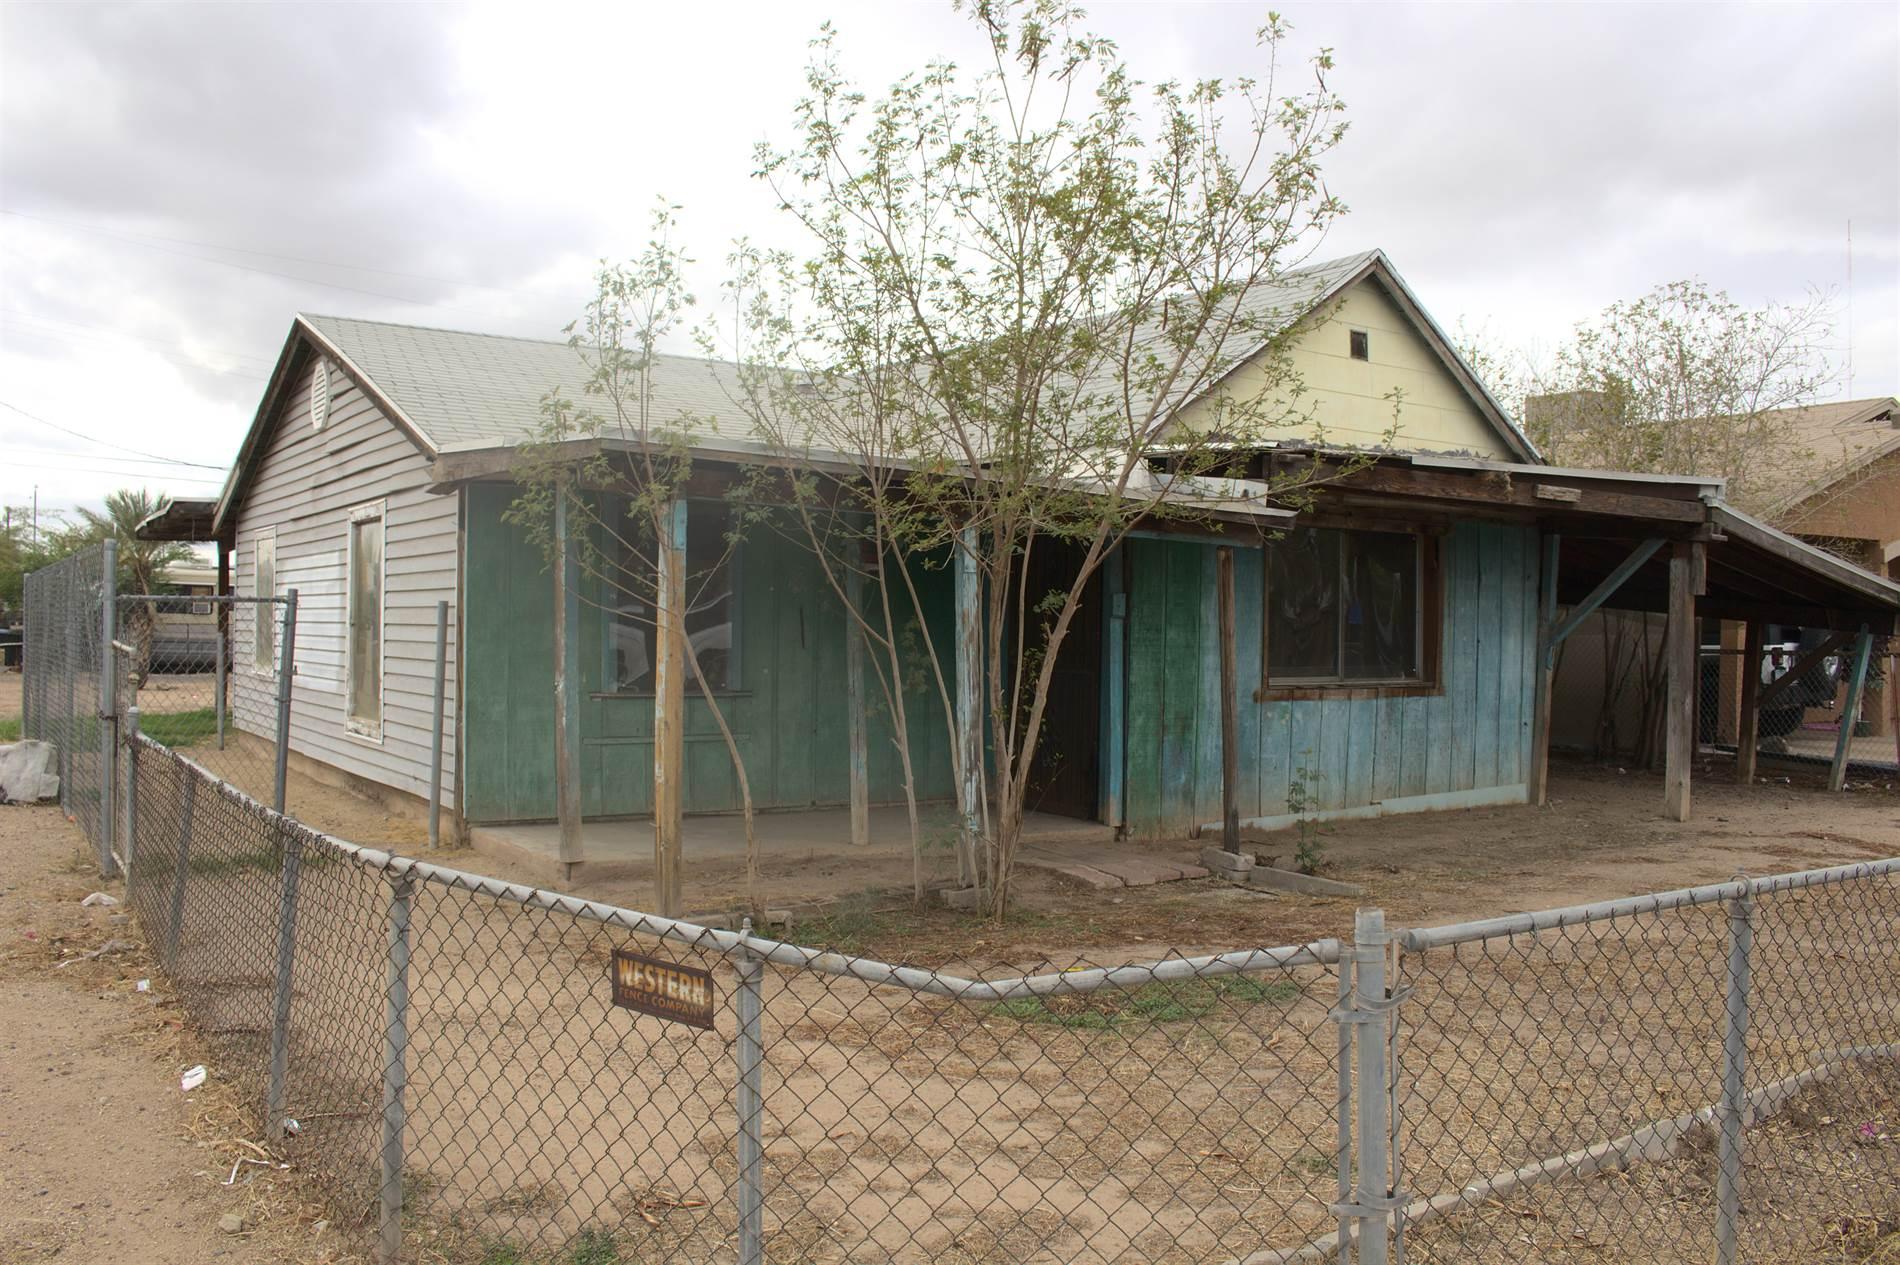 2101 W. Tonto, Phoenix, AZ 85009